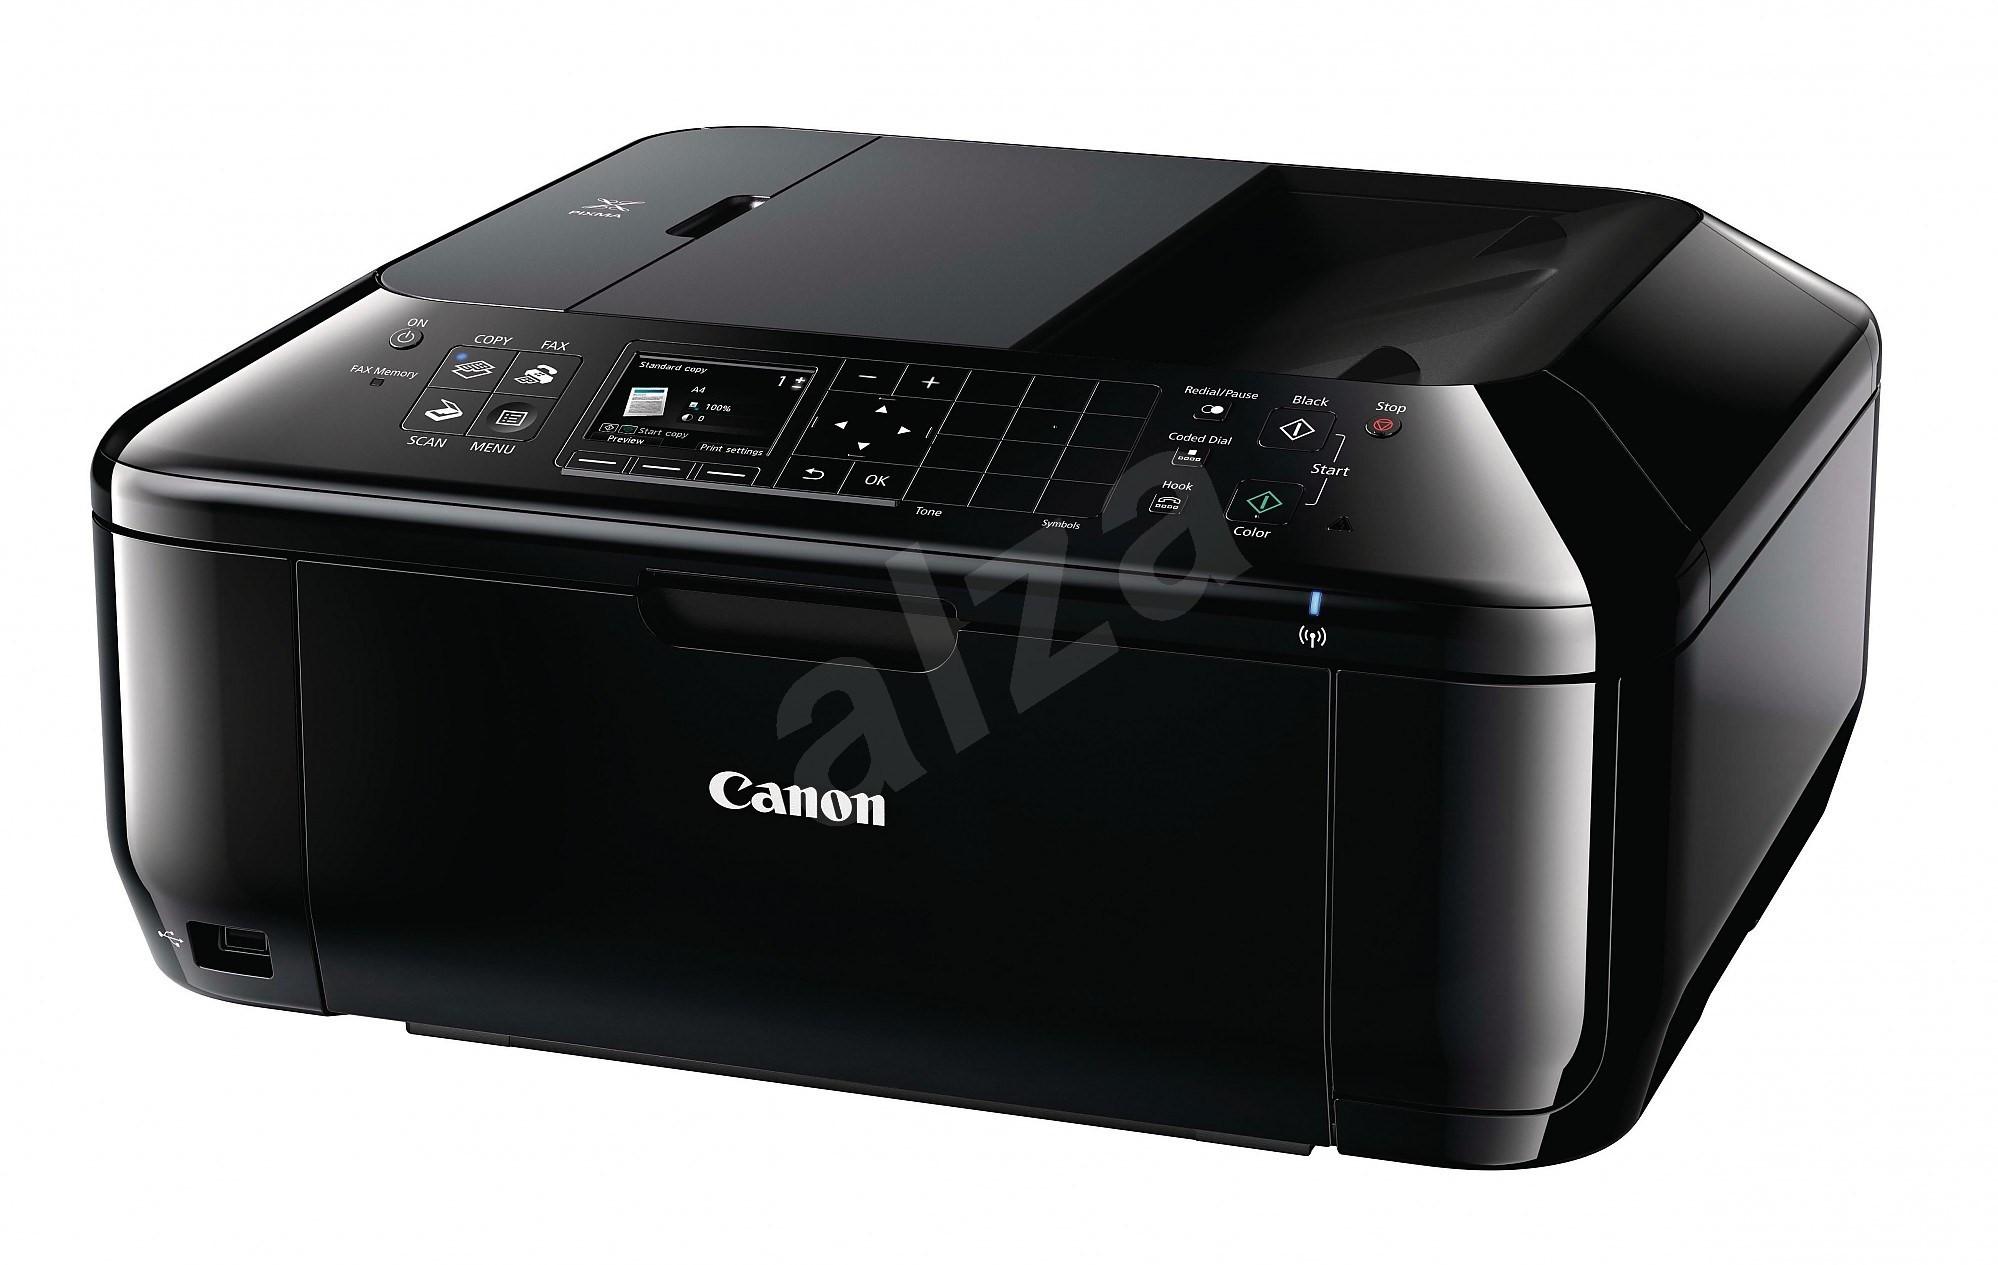 canon pixma mx925 tintenstrahldrucker. Black Bedroom Furniture Sets. Home Design Ideas